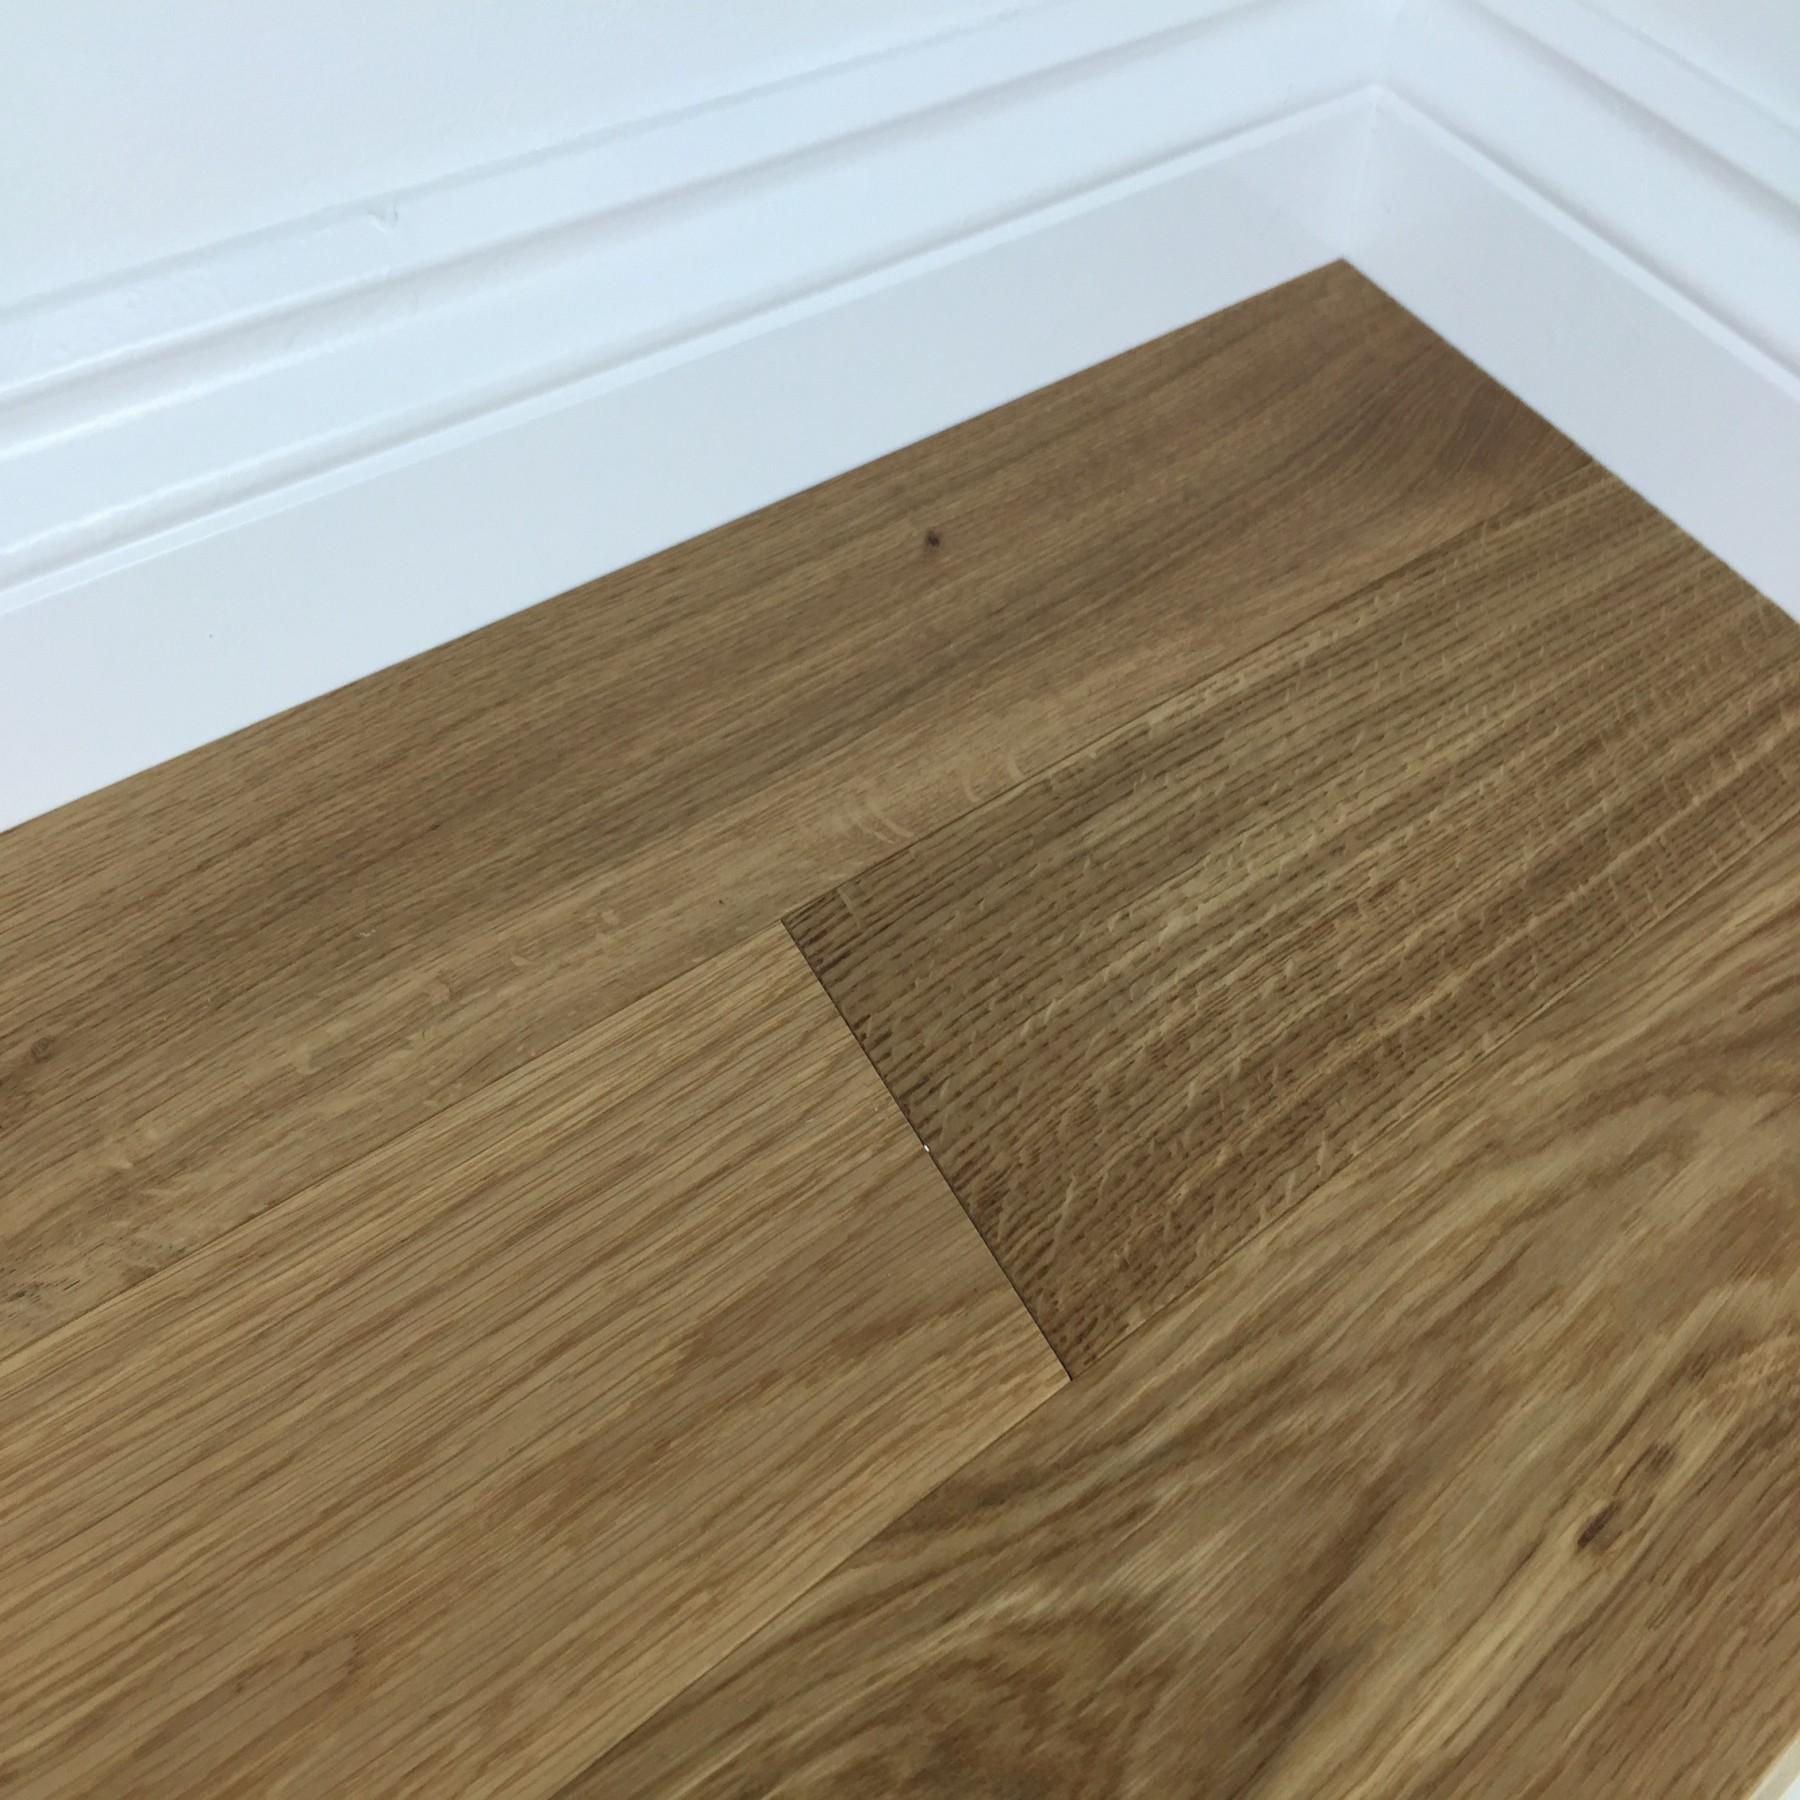 ACUTA CARIBOU Oak Flooring Smoked Brushed & Matt Lacquered